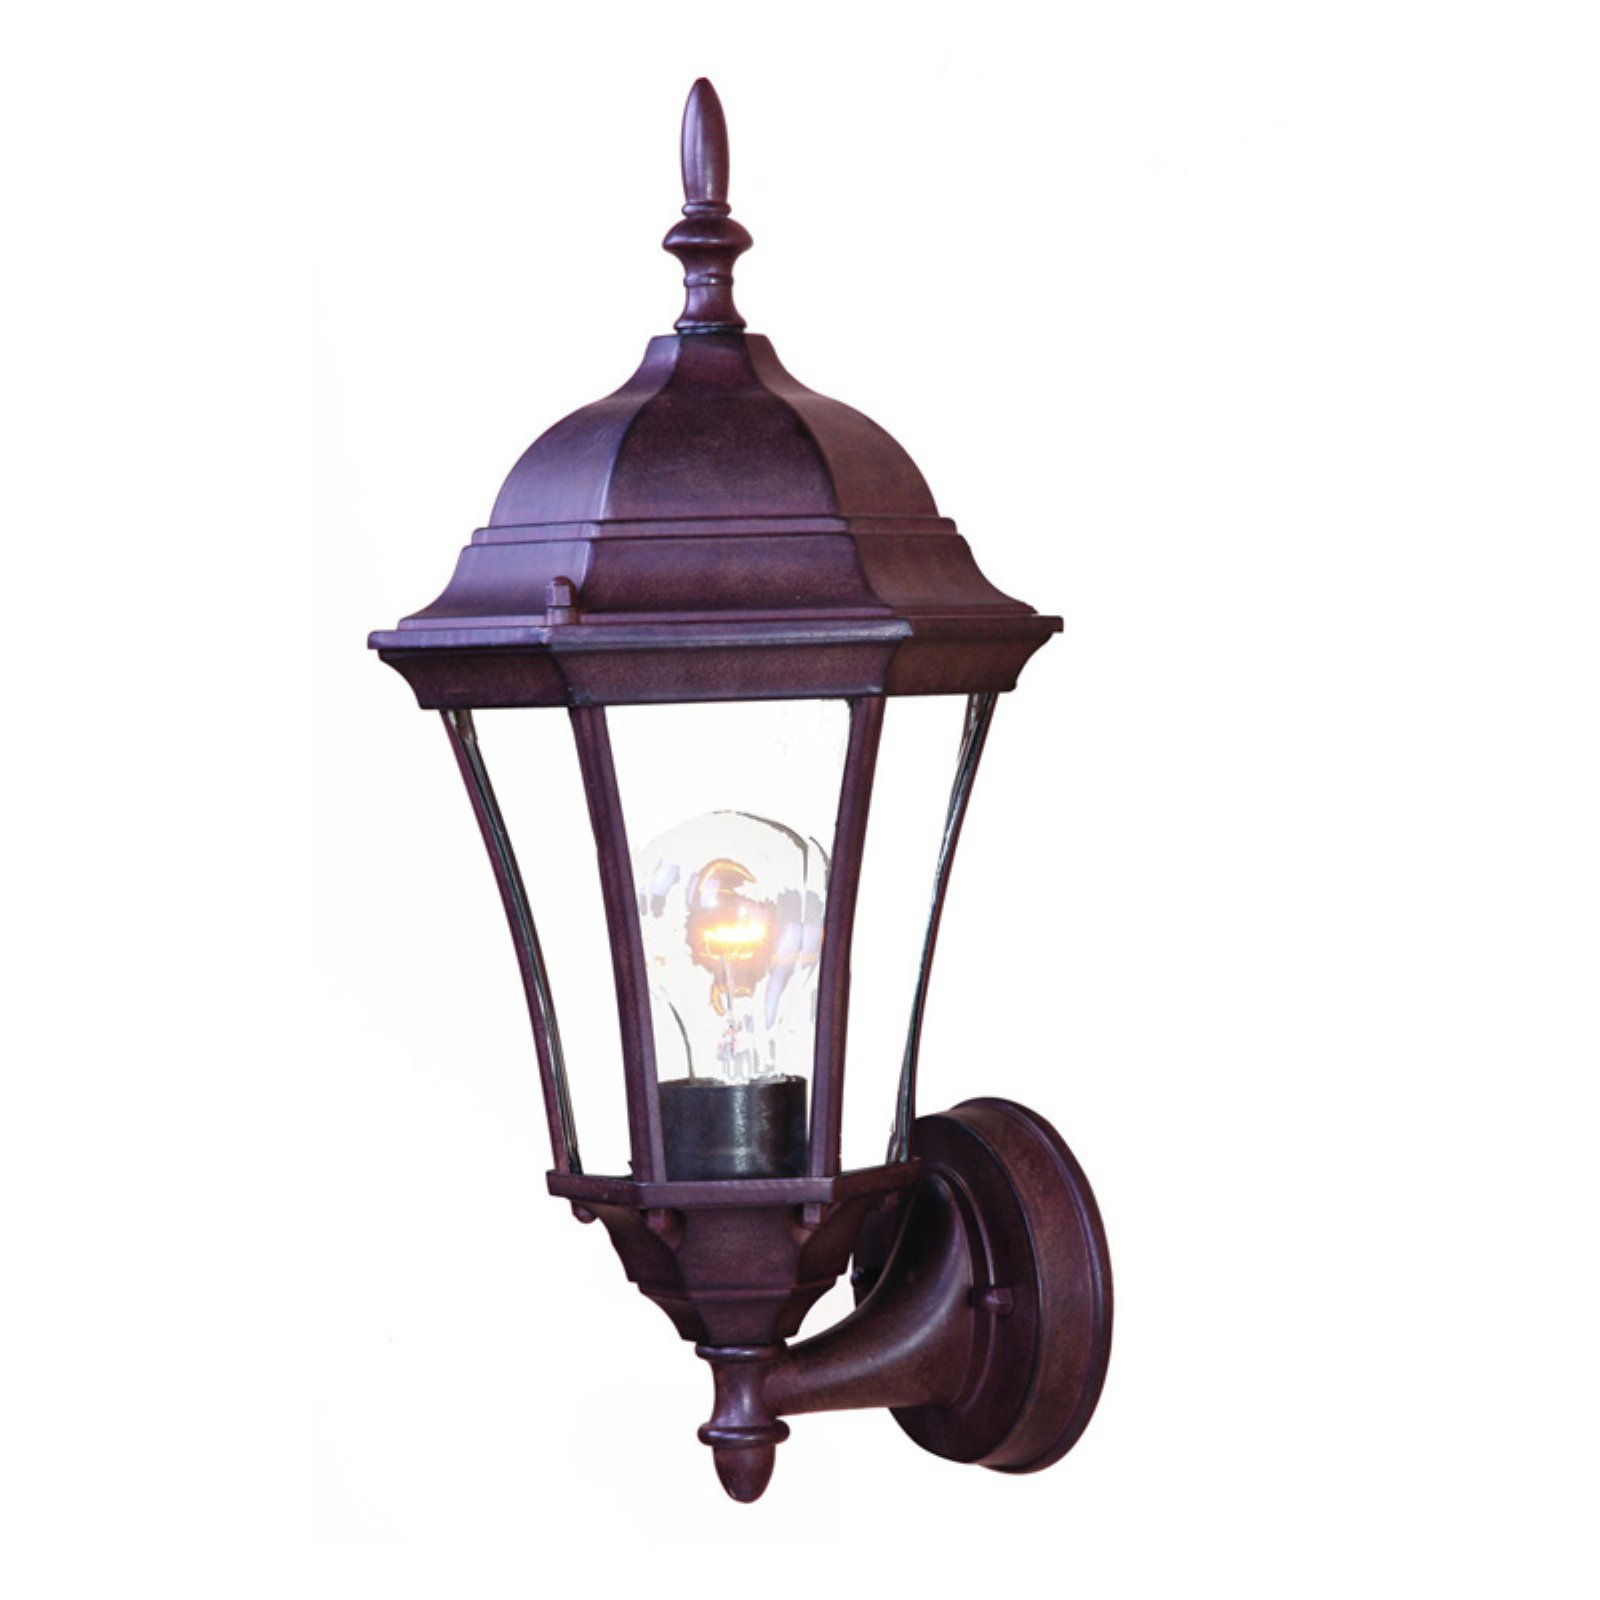 Acclaim Lighting Bryn Mawr Outdoor Wall Mount Light Fixture